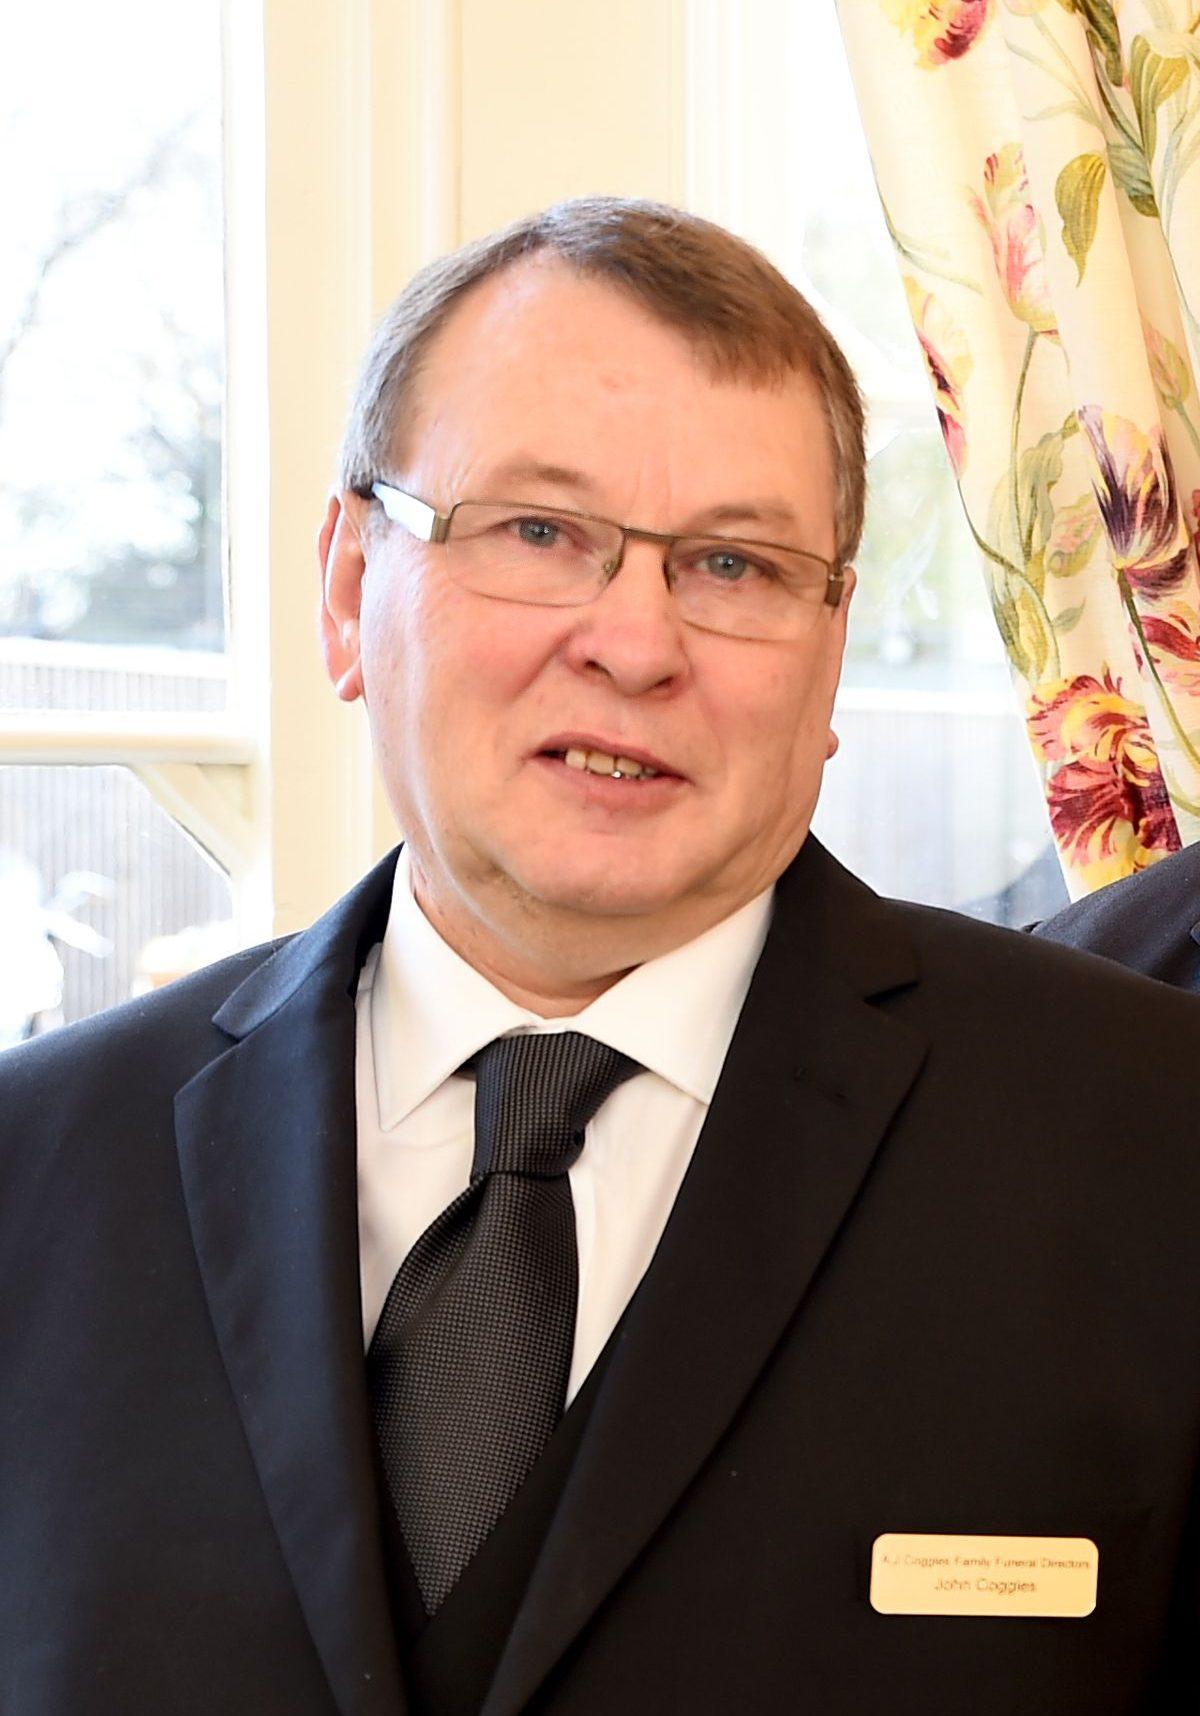 John Coggles - Owner Funeral Director